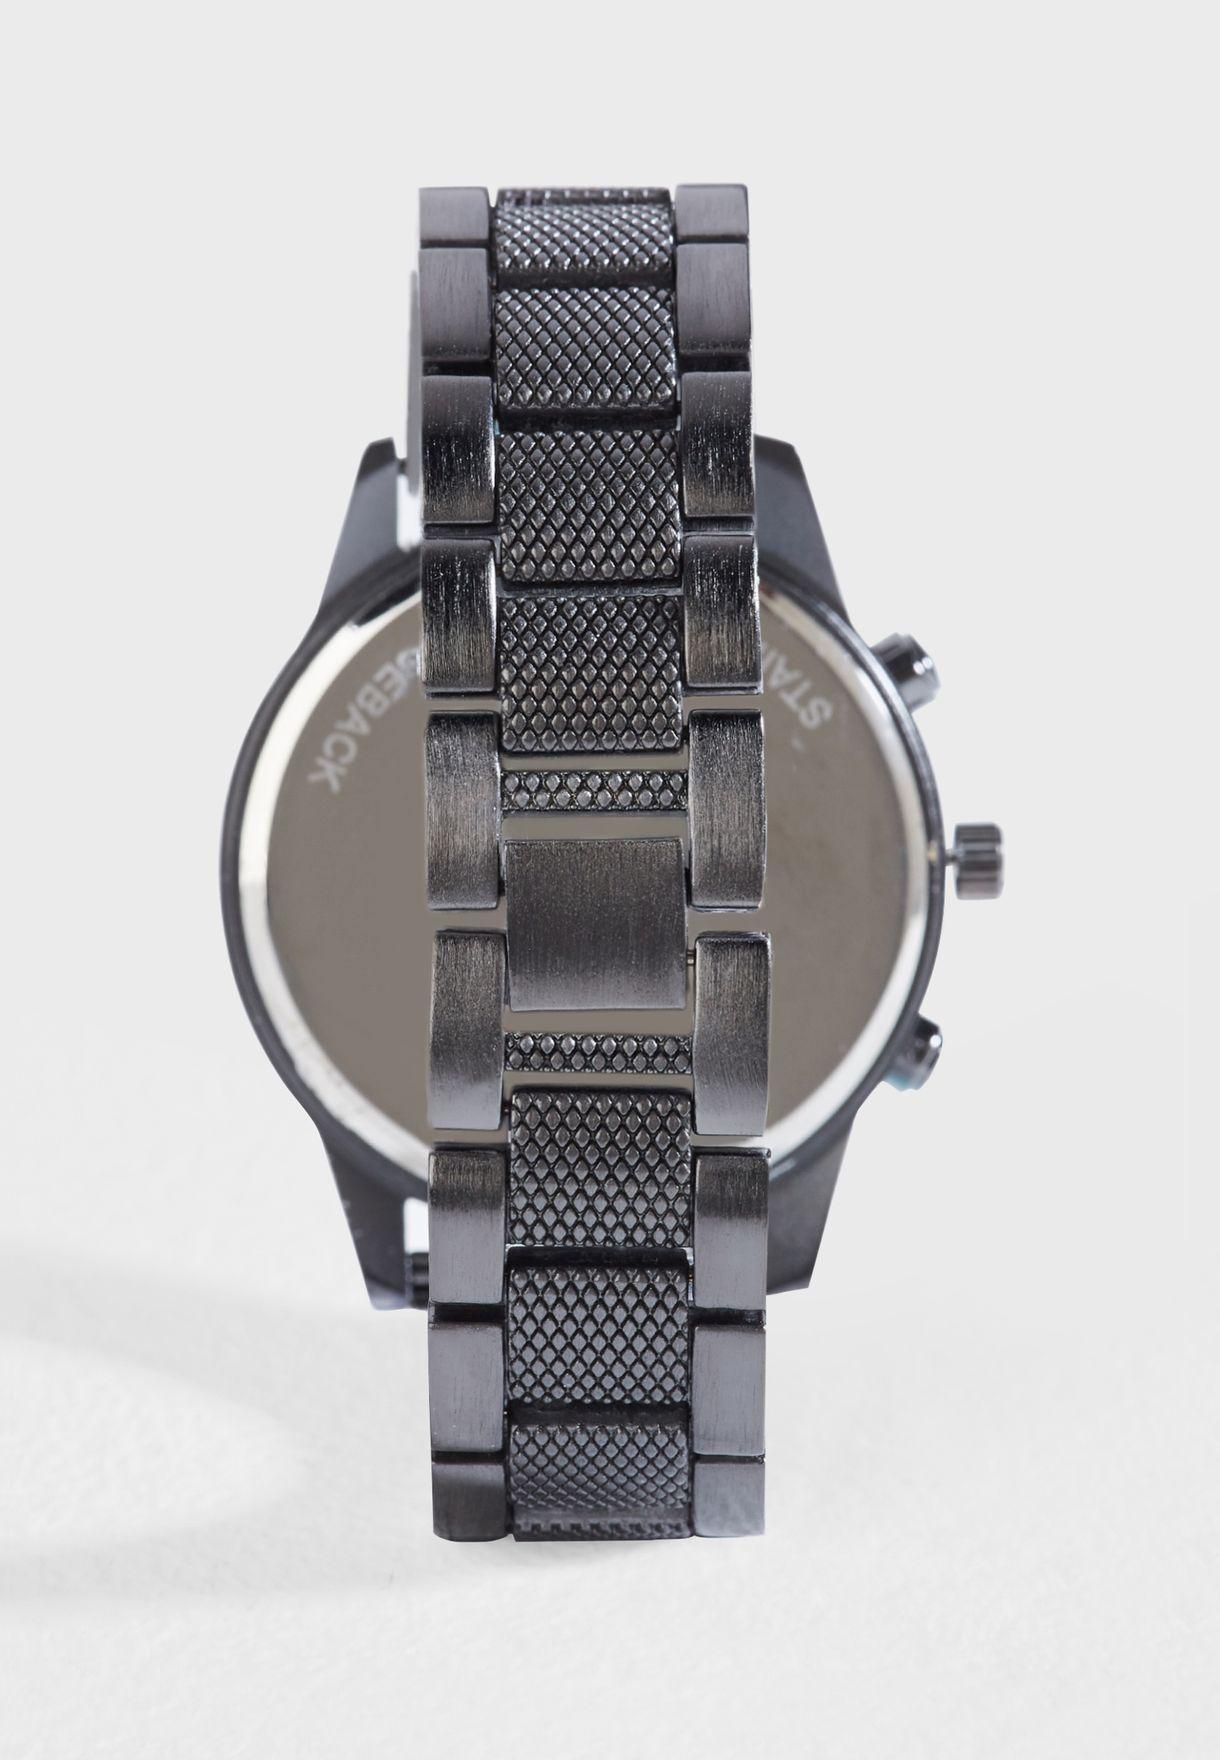 Metal Strap Analogue Watch